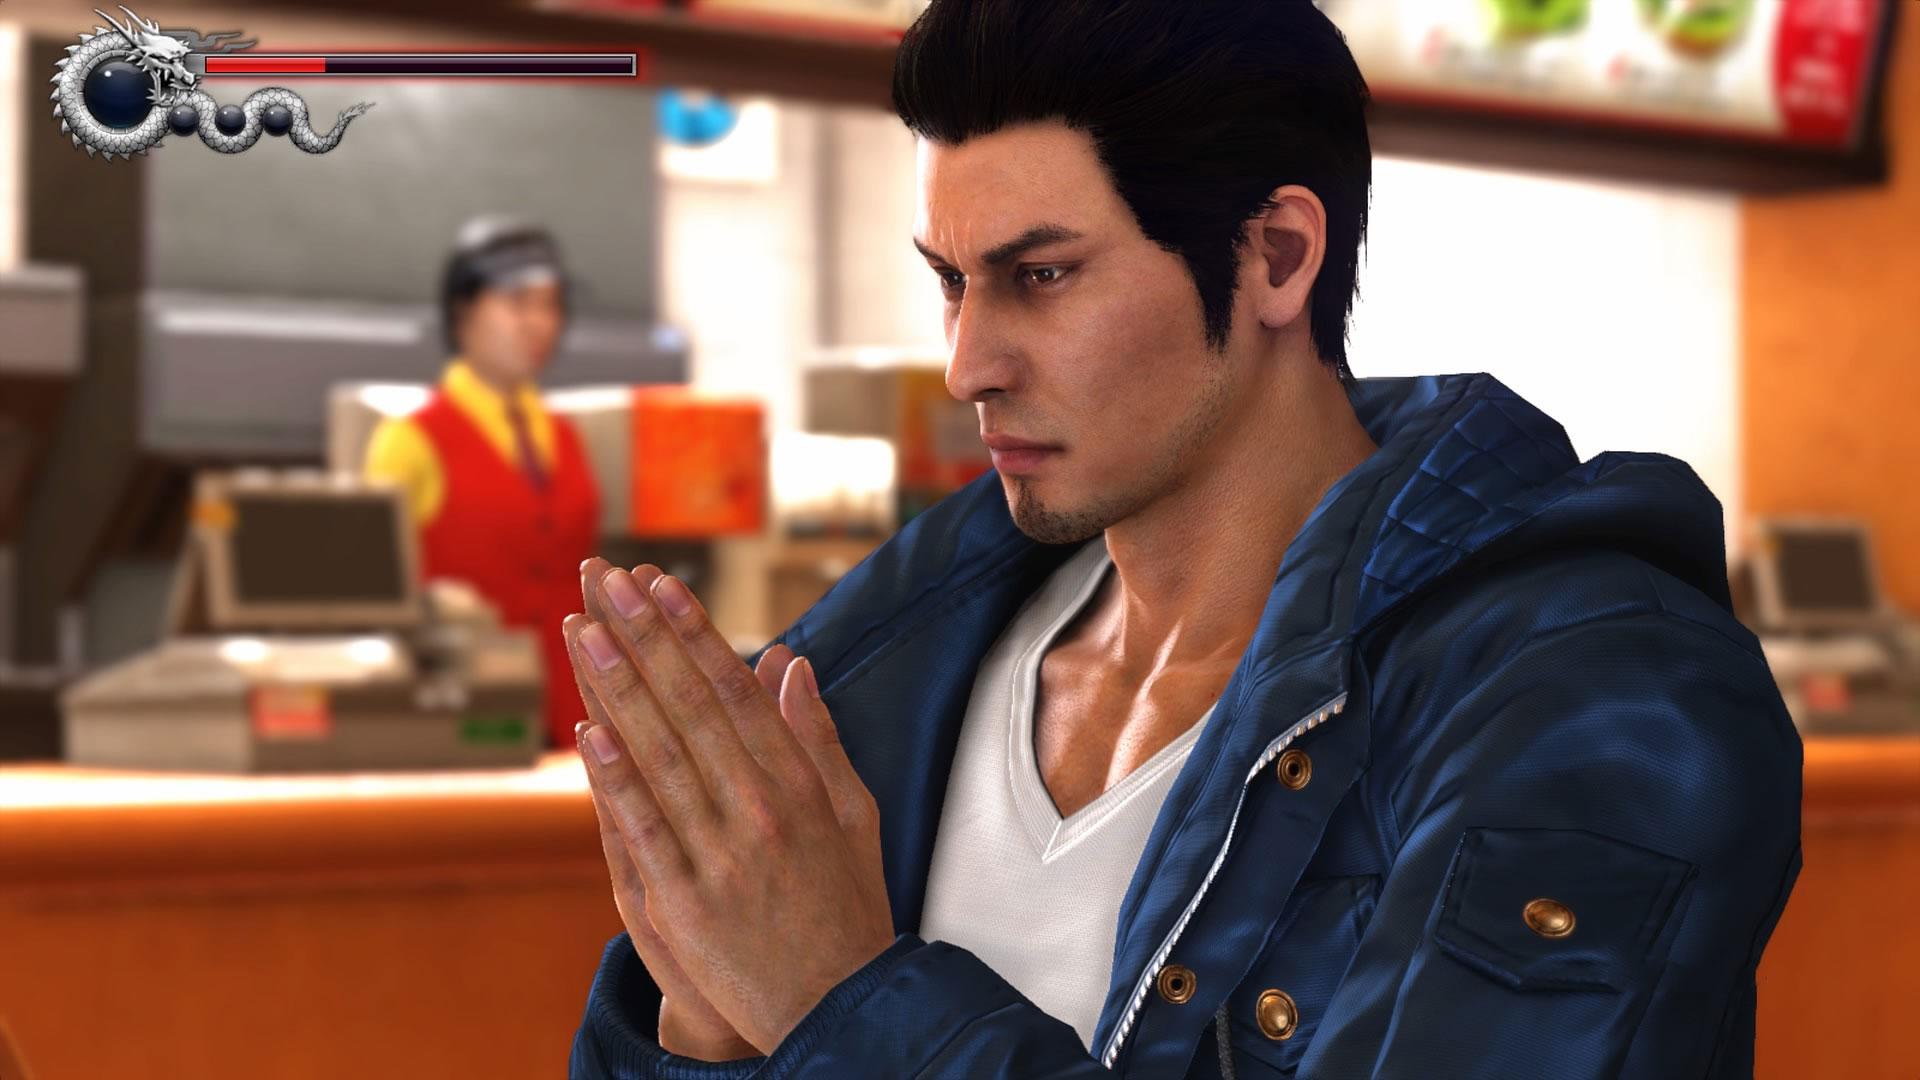 Sega seems up for Yakuza and Persona on PC screenshot